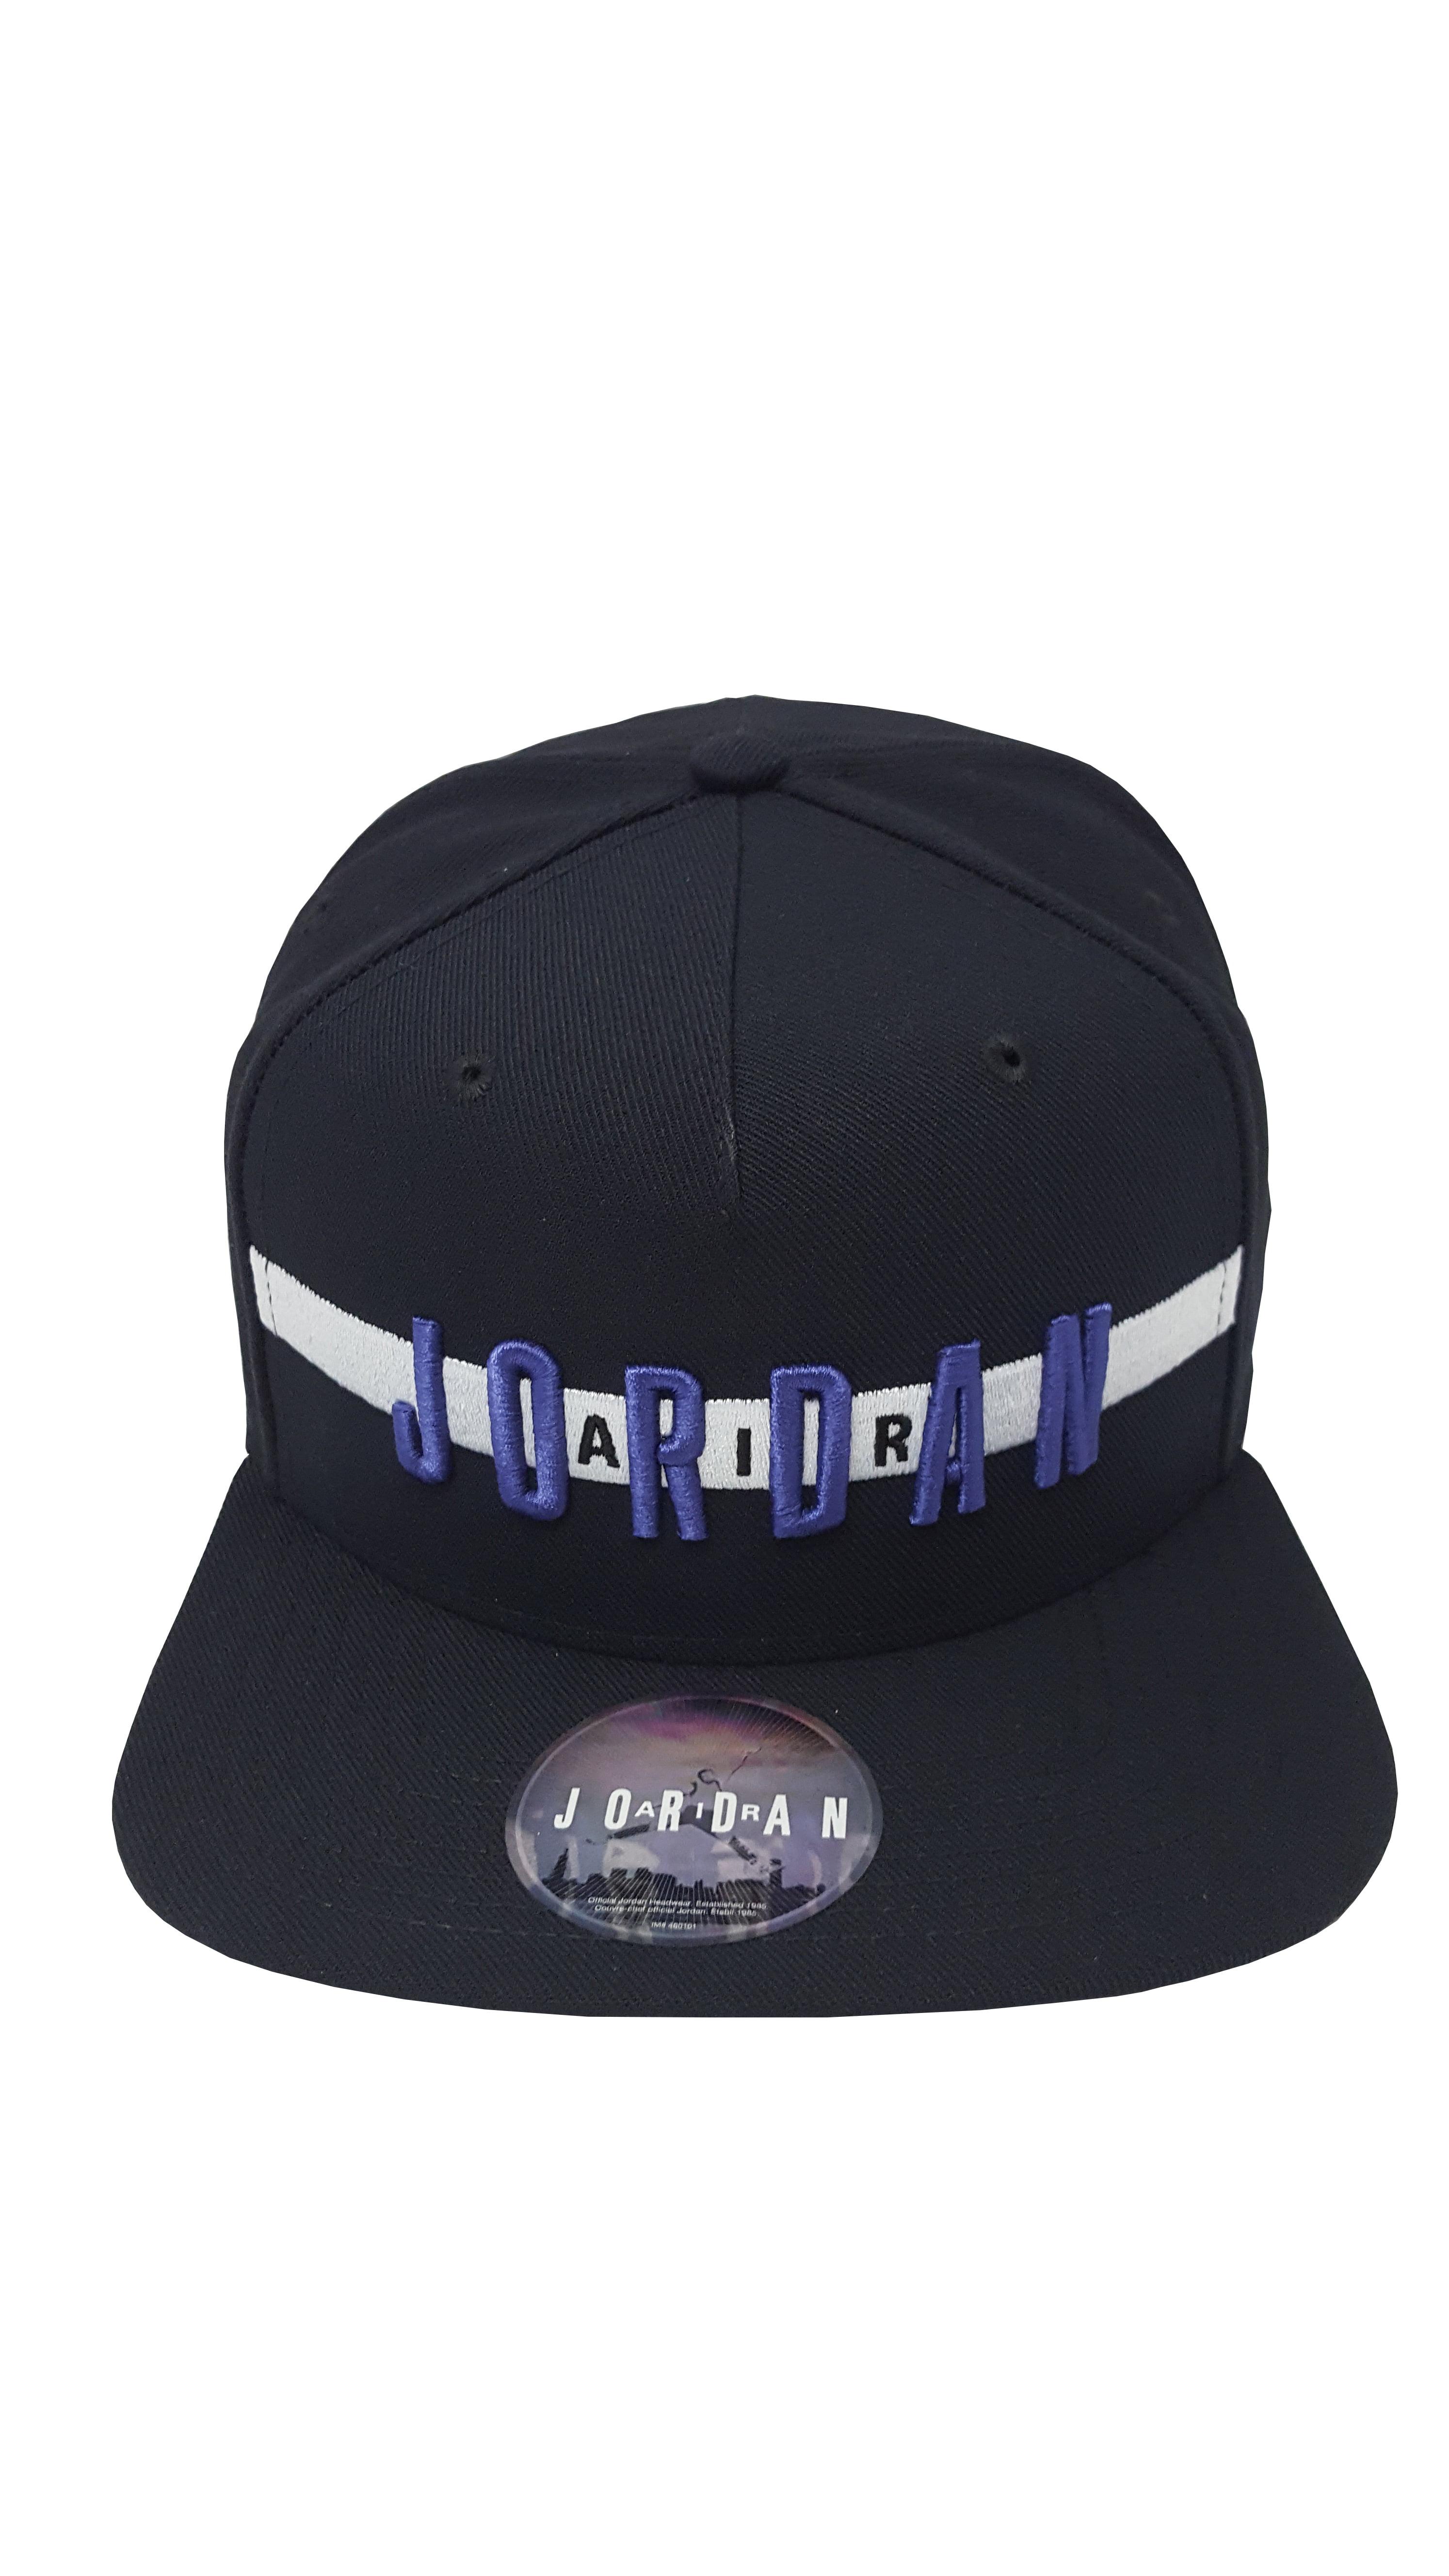 2484598dc49b65 ... nike nike jordan air snapback hat black concord adjutable fit walmart.  com